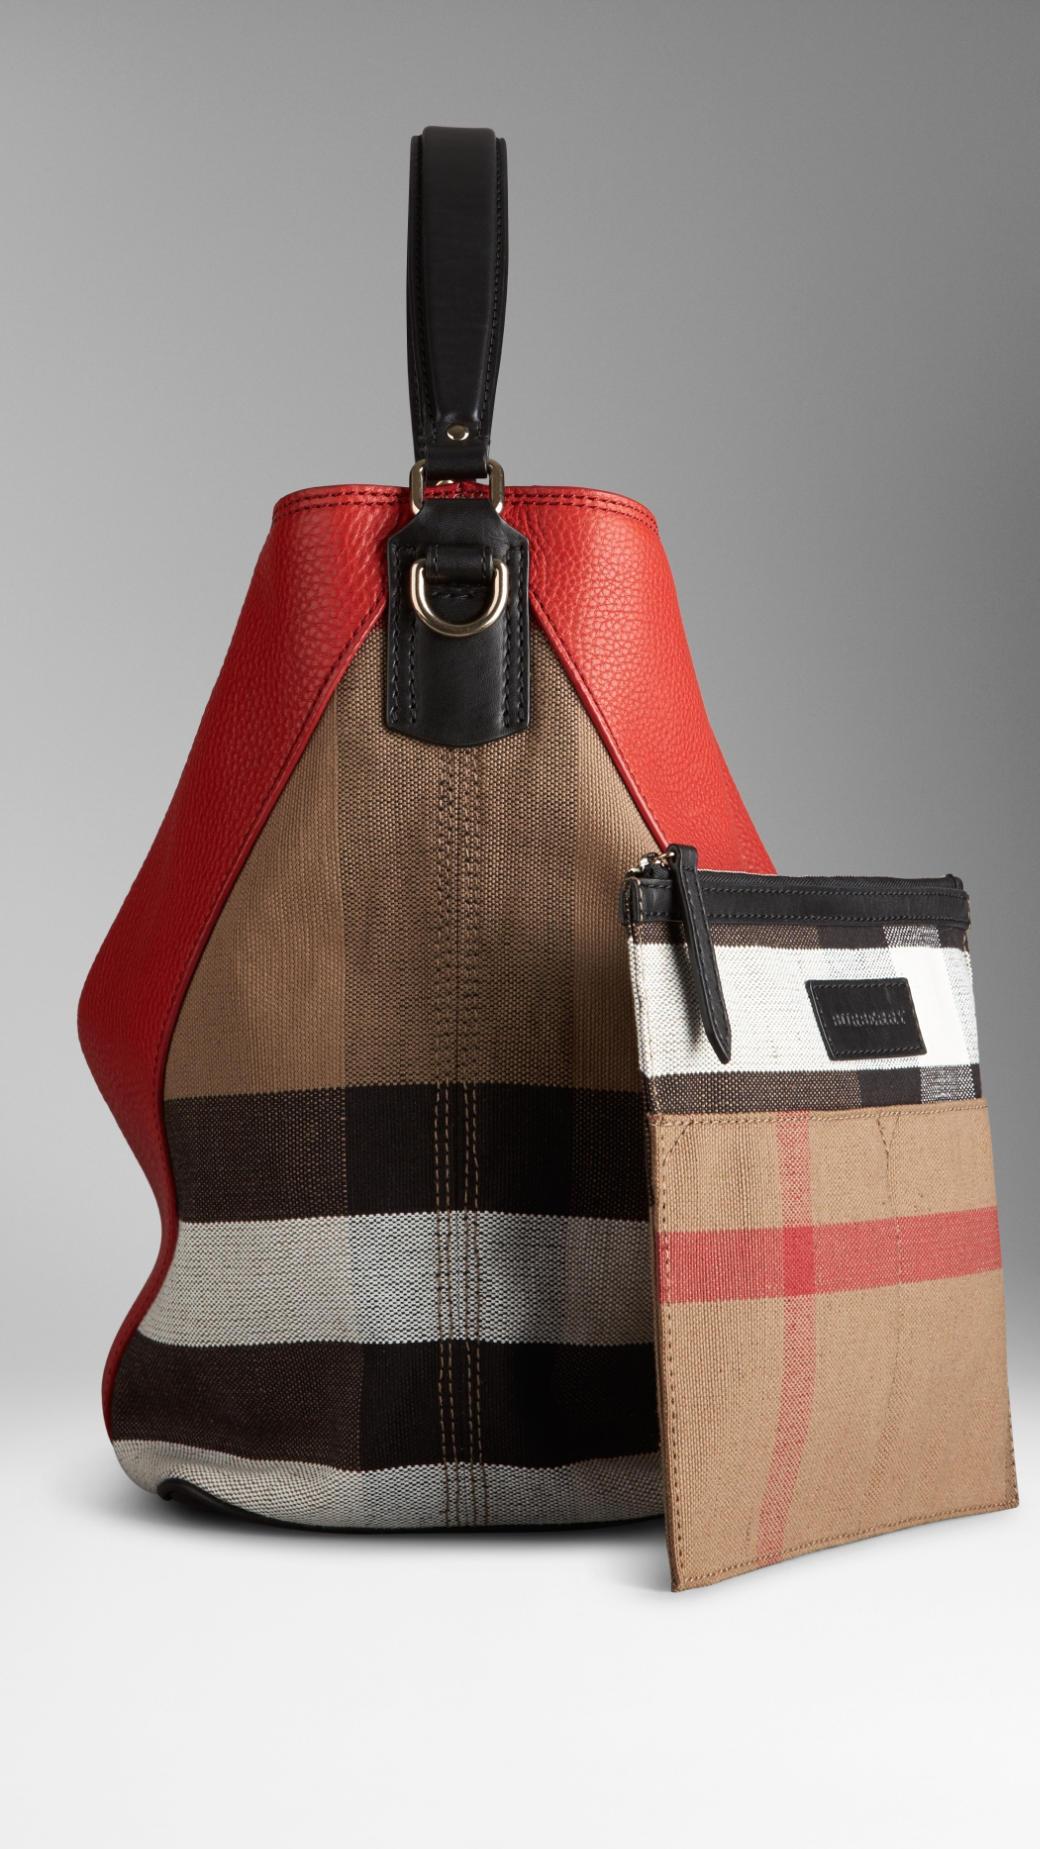 ad3cd1e1a24f Burberry Hobo Bag. Burberry Handbags Wallets For Women Nordstrom